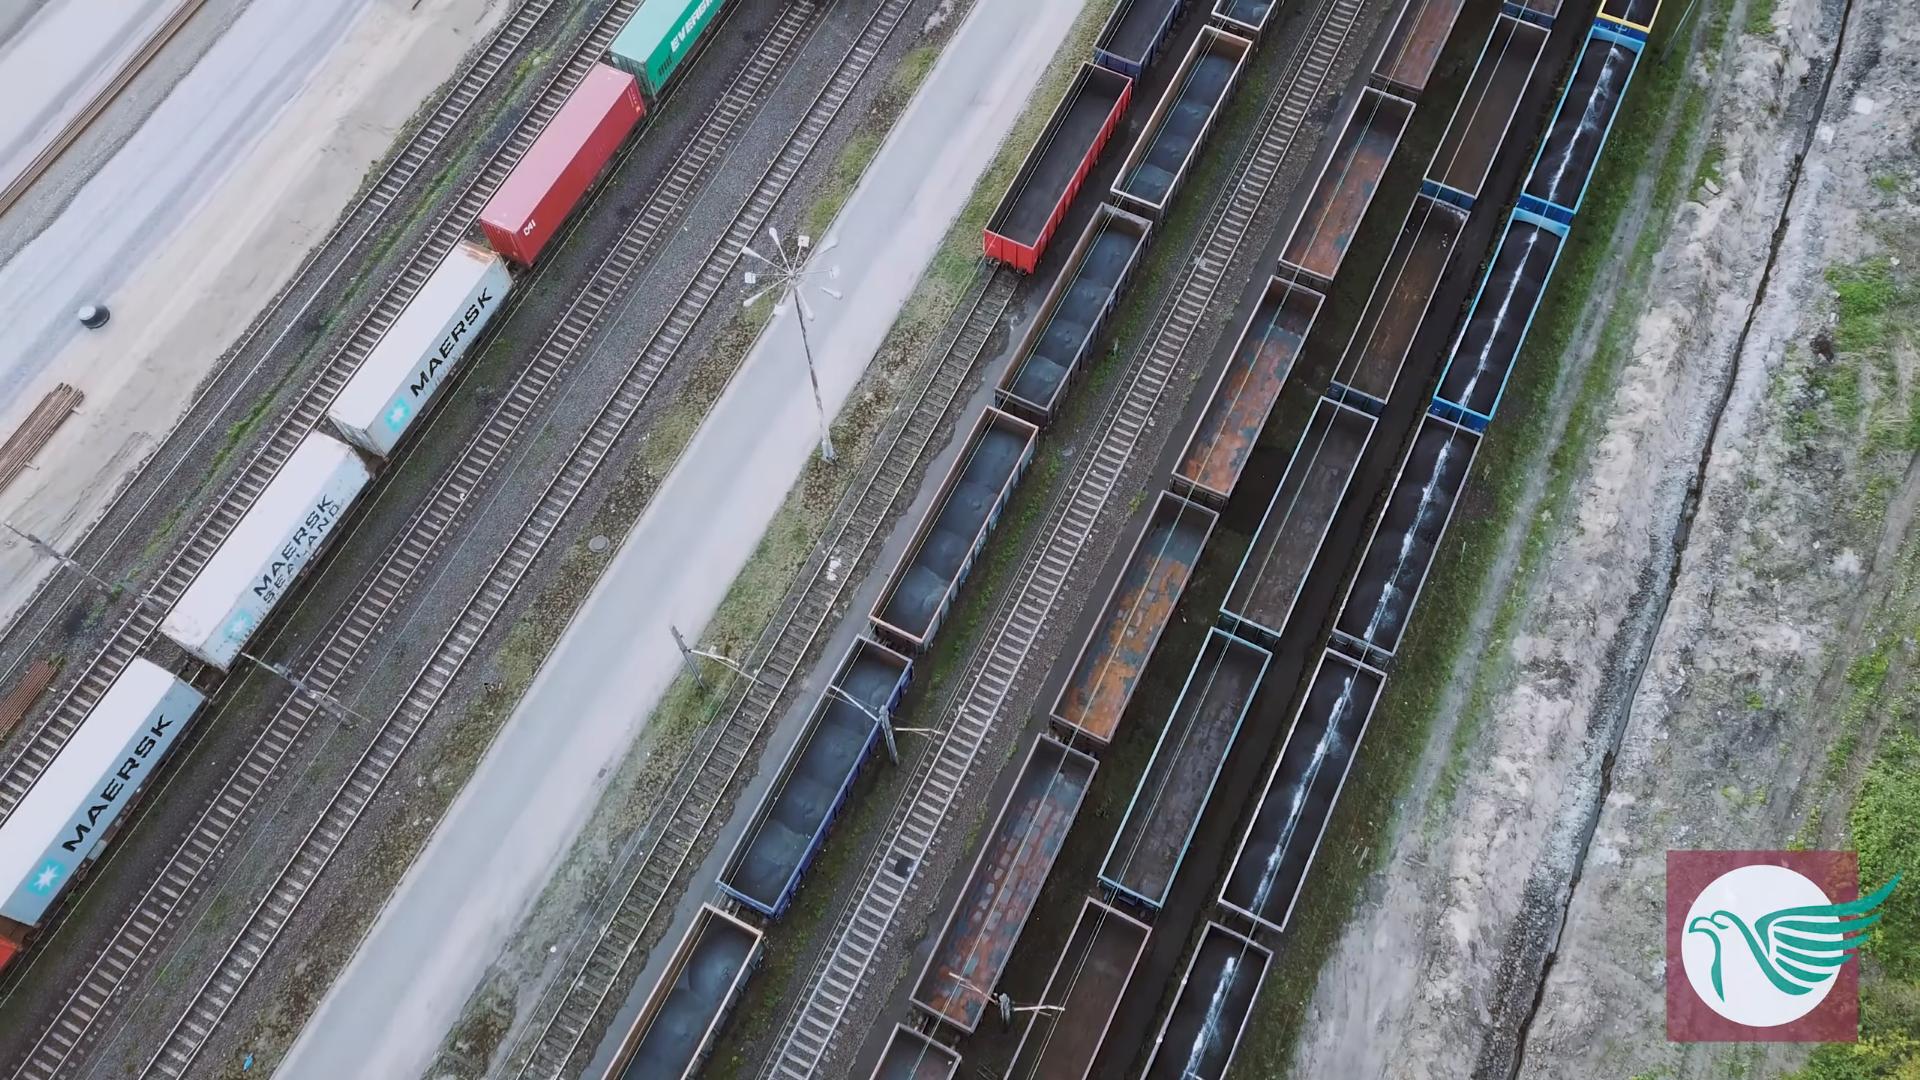 transport kolejowy, inwestycje, nowe szlaki kolejowe, TEN-T, CPK